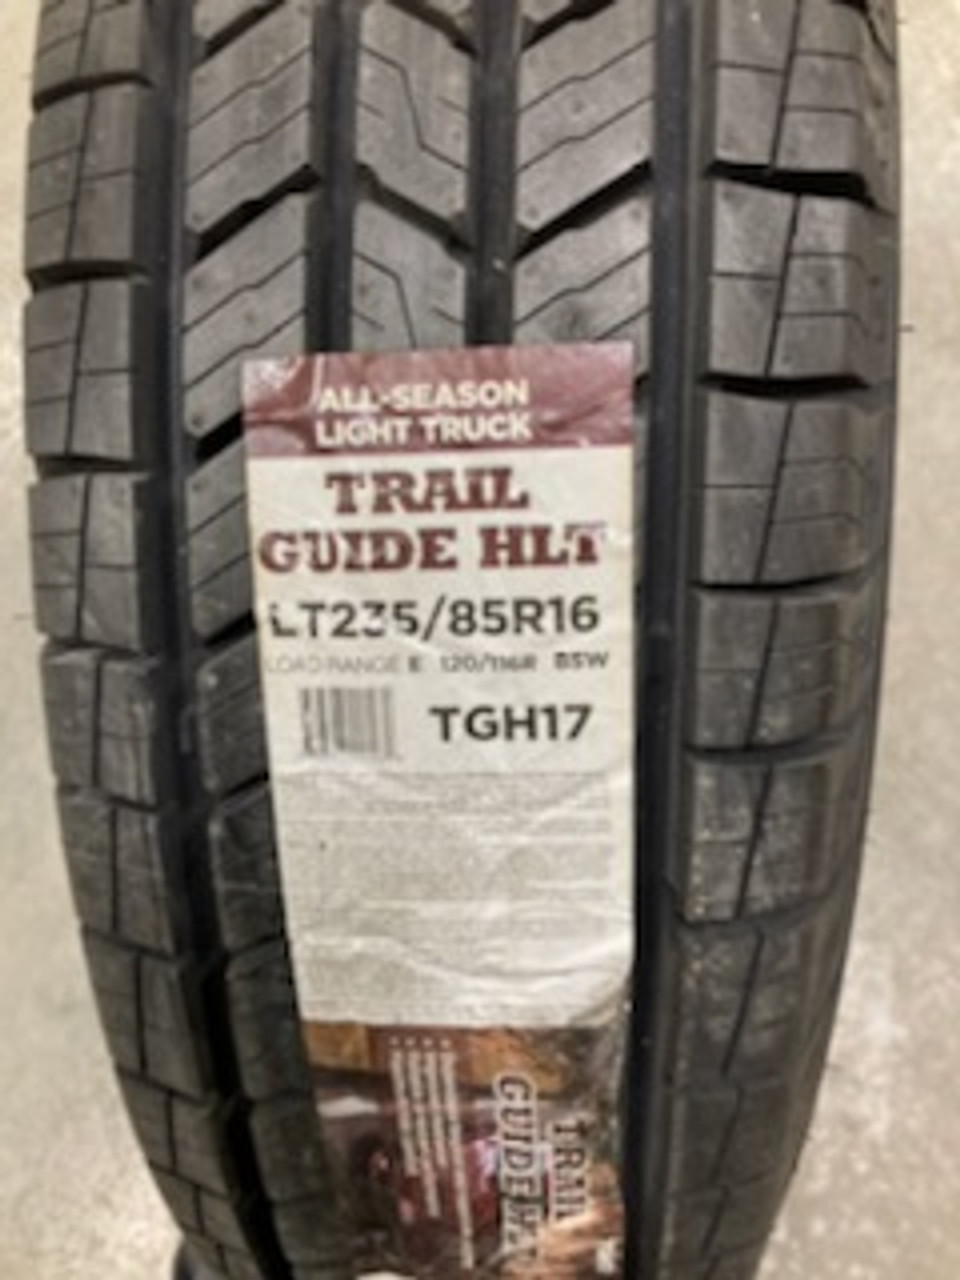 New Tire 235 85 16 Trail Guide HLT Highway 10 ply LT235/85R16